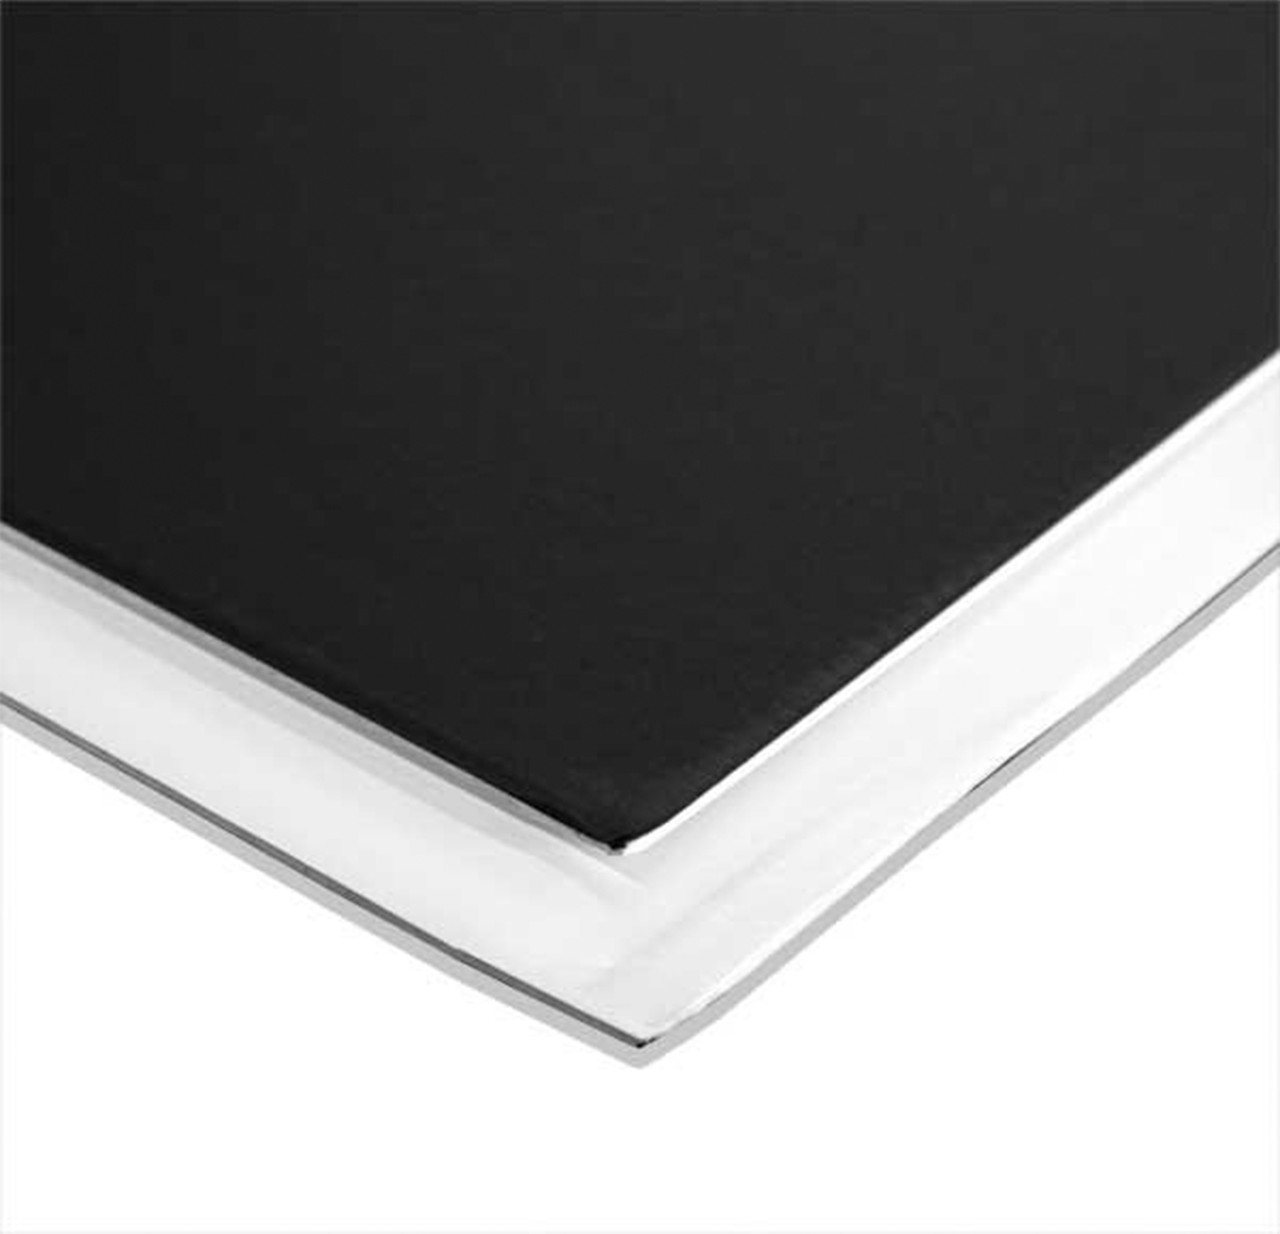 "Foamboard - Black/White - 4' x 10' x 1/2"""